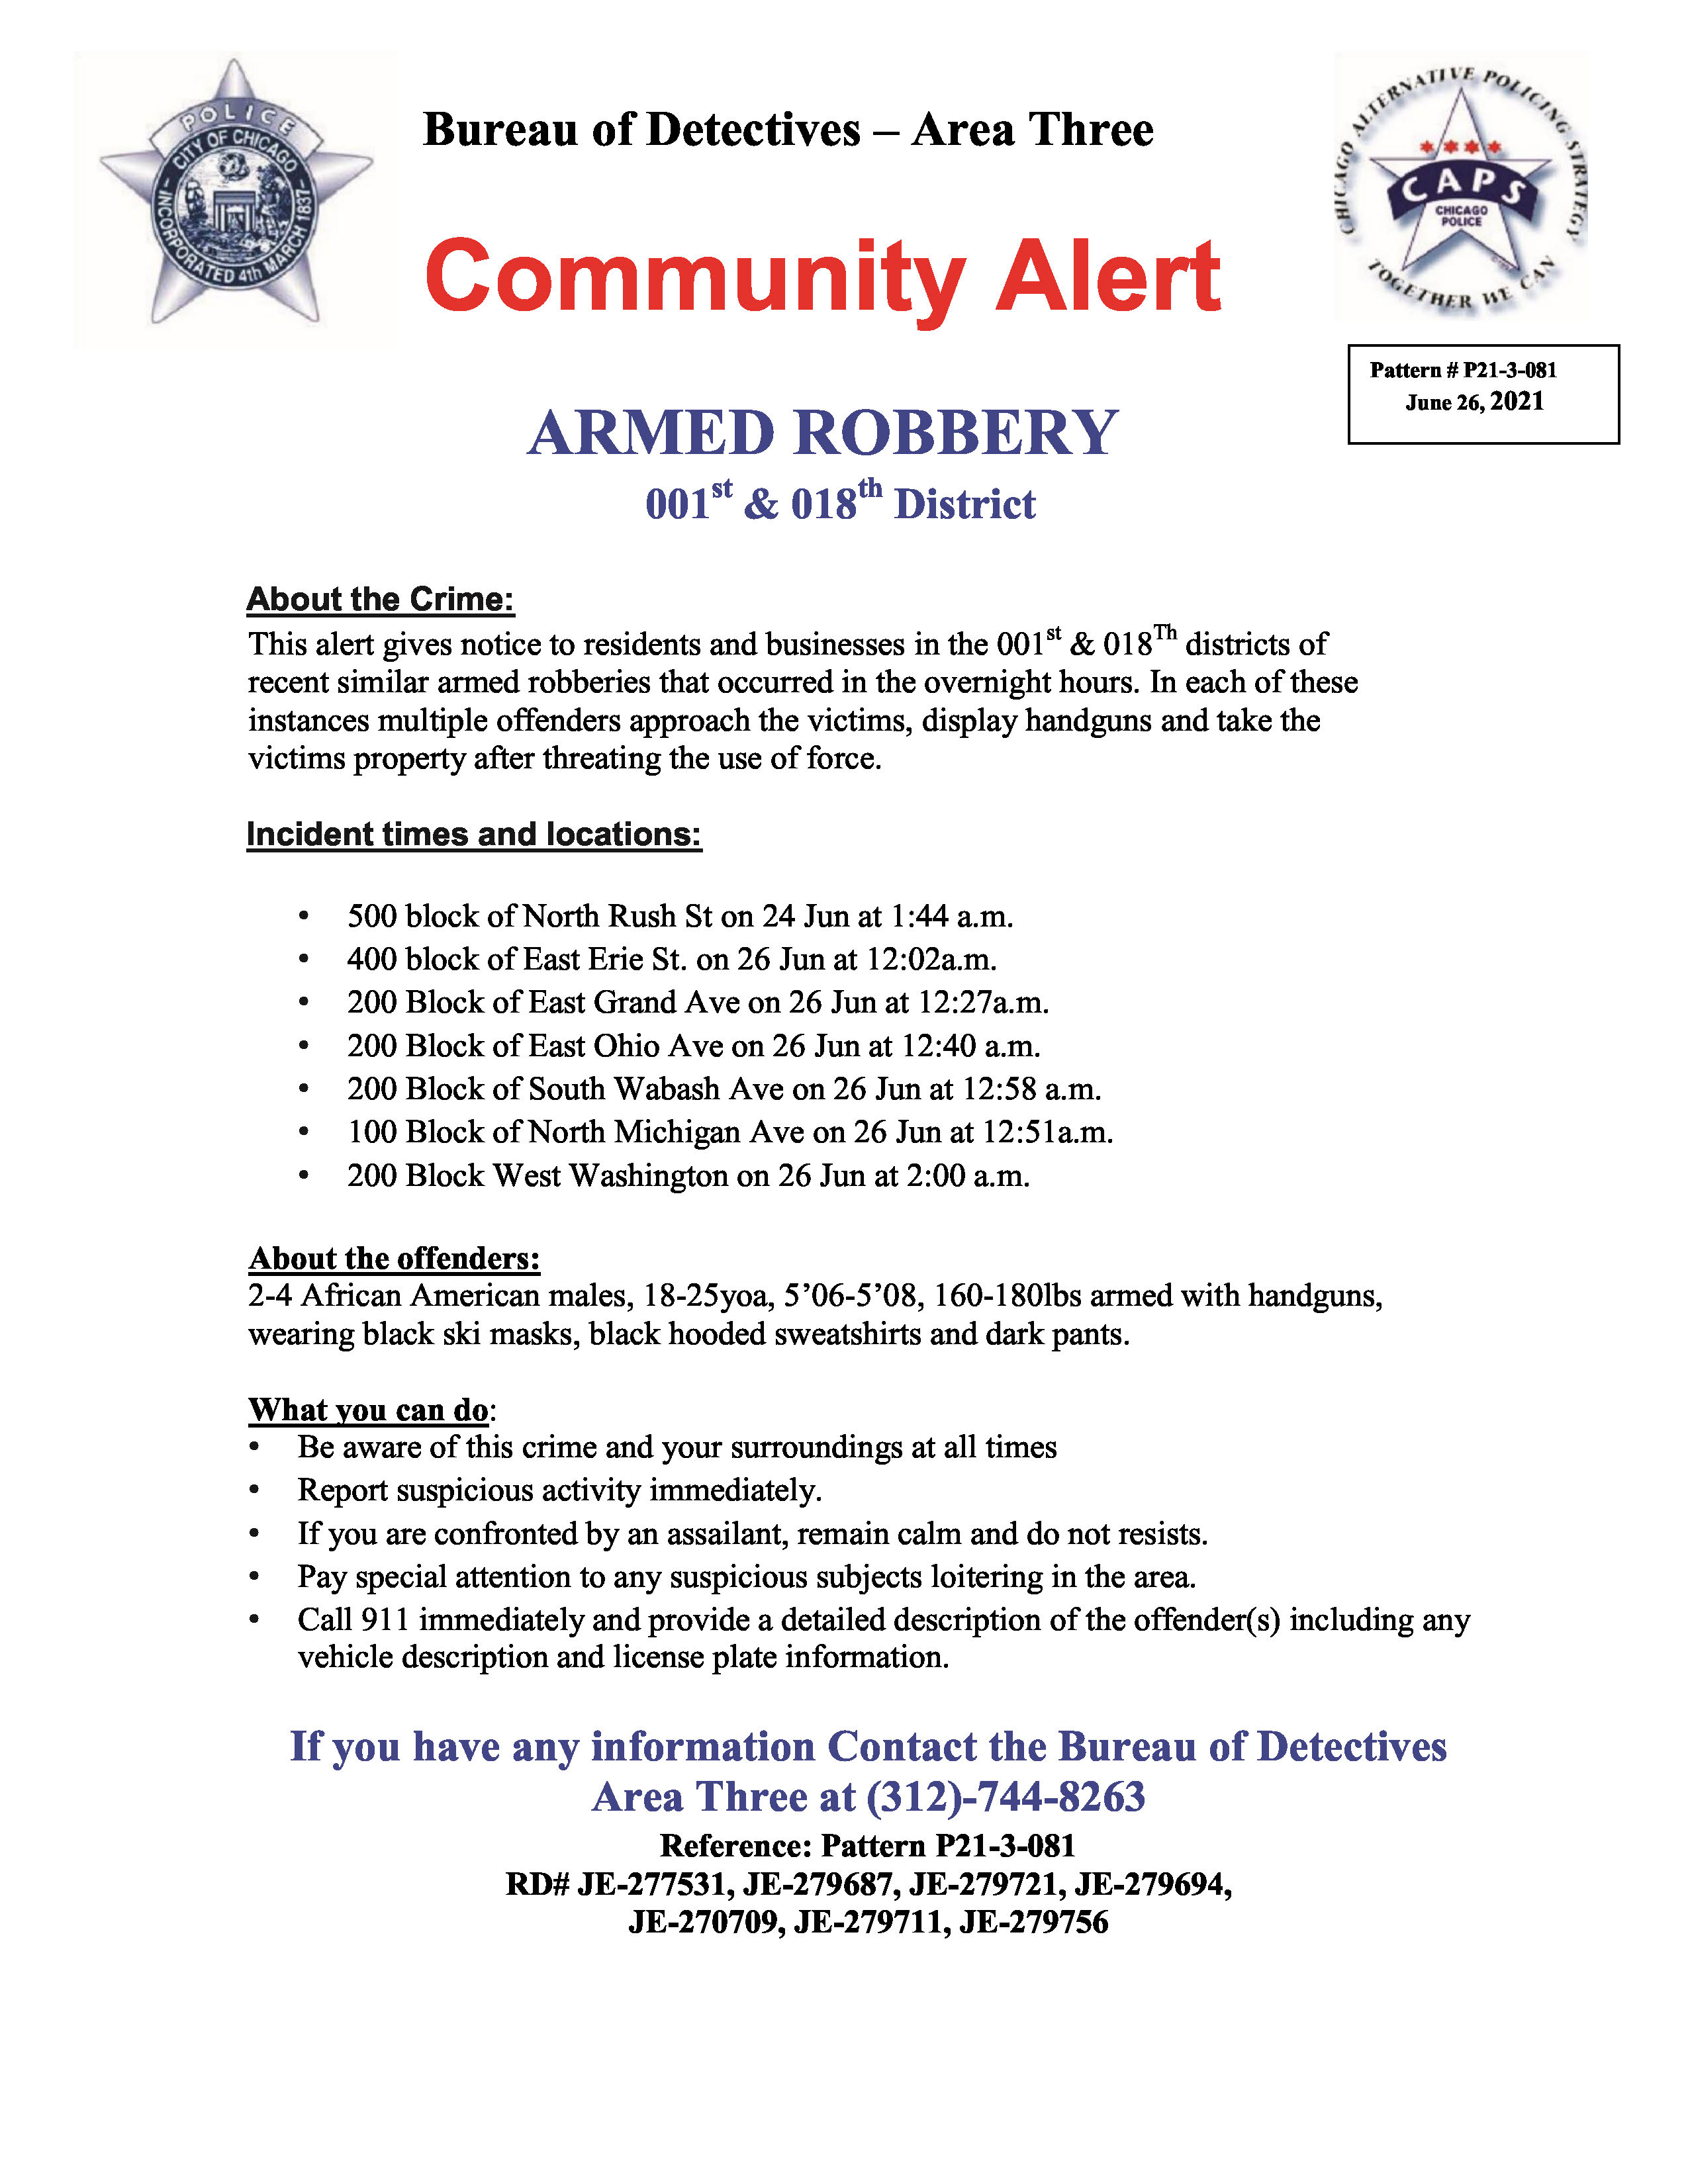 Community Alert Armed Robbery 001 & 018 26 JUN_Page_1